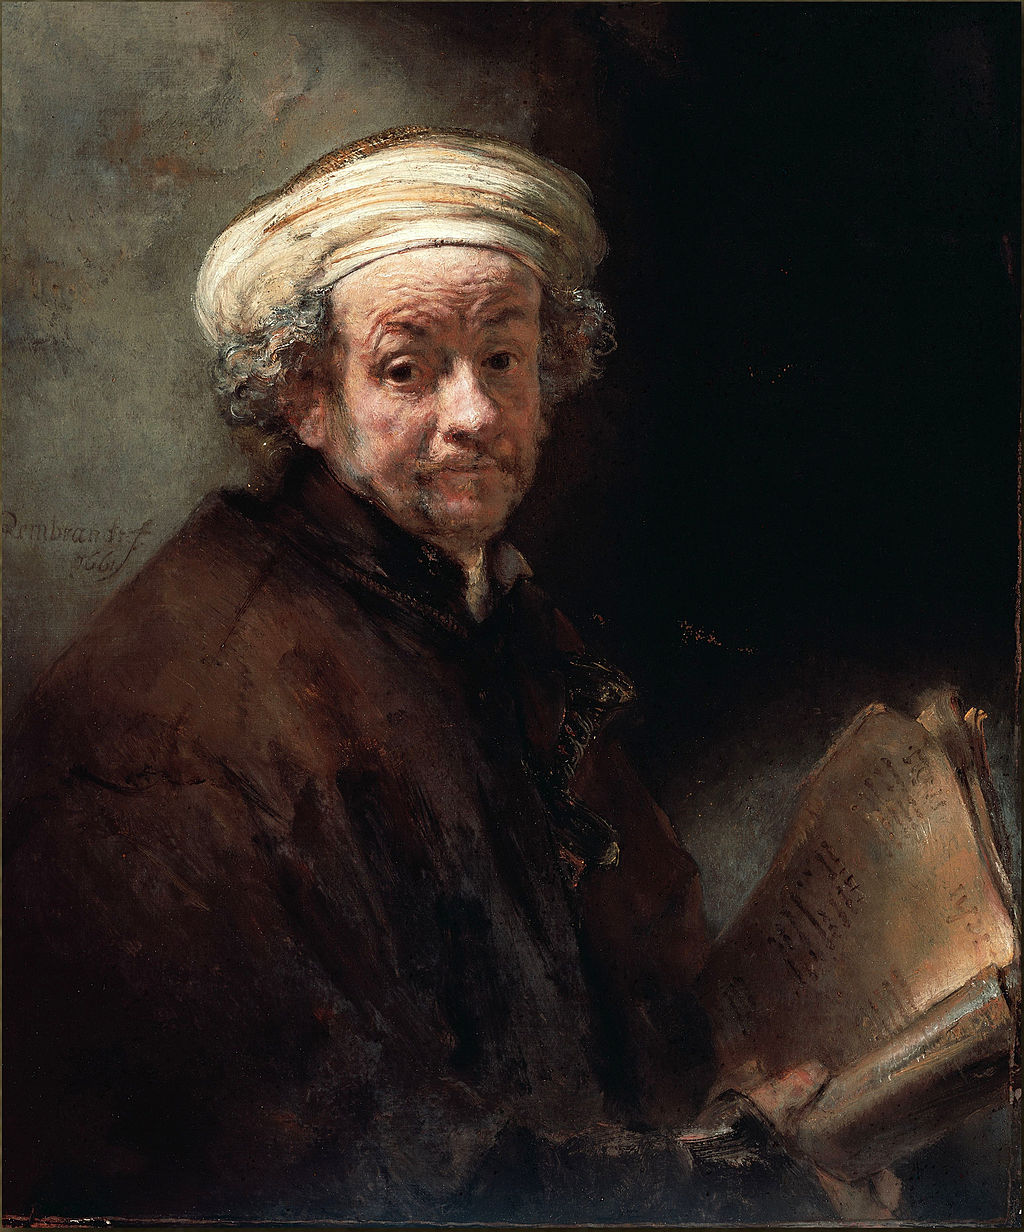 Avtoportret kot Apostol Pavel